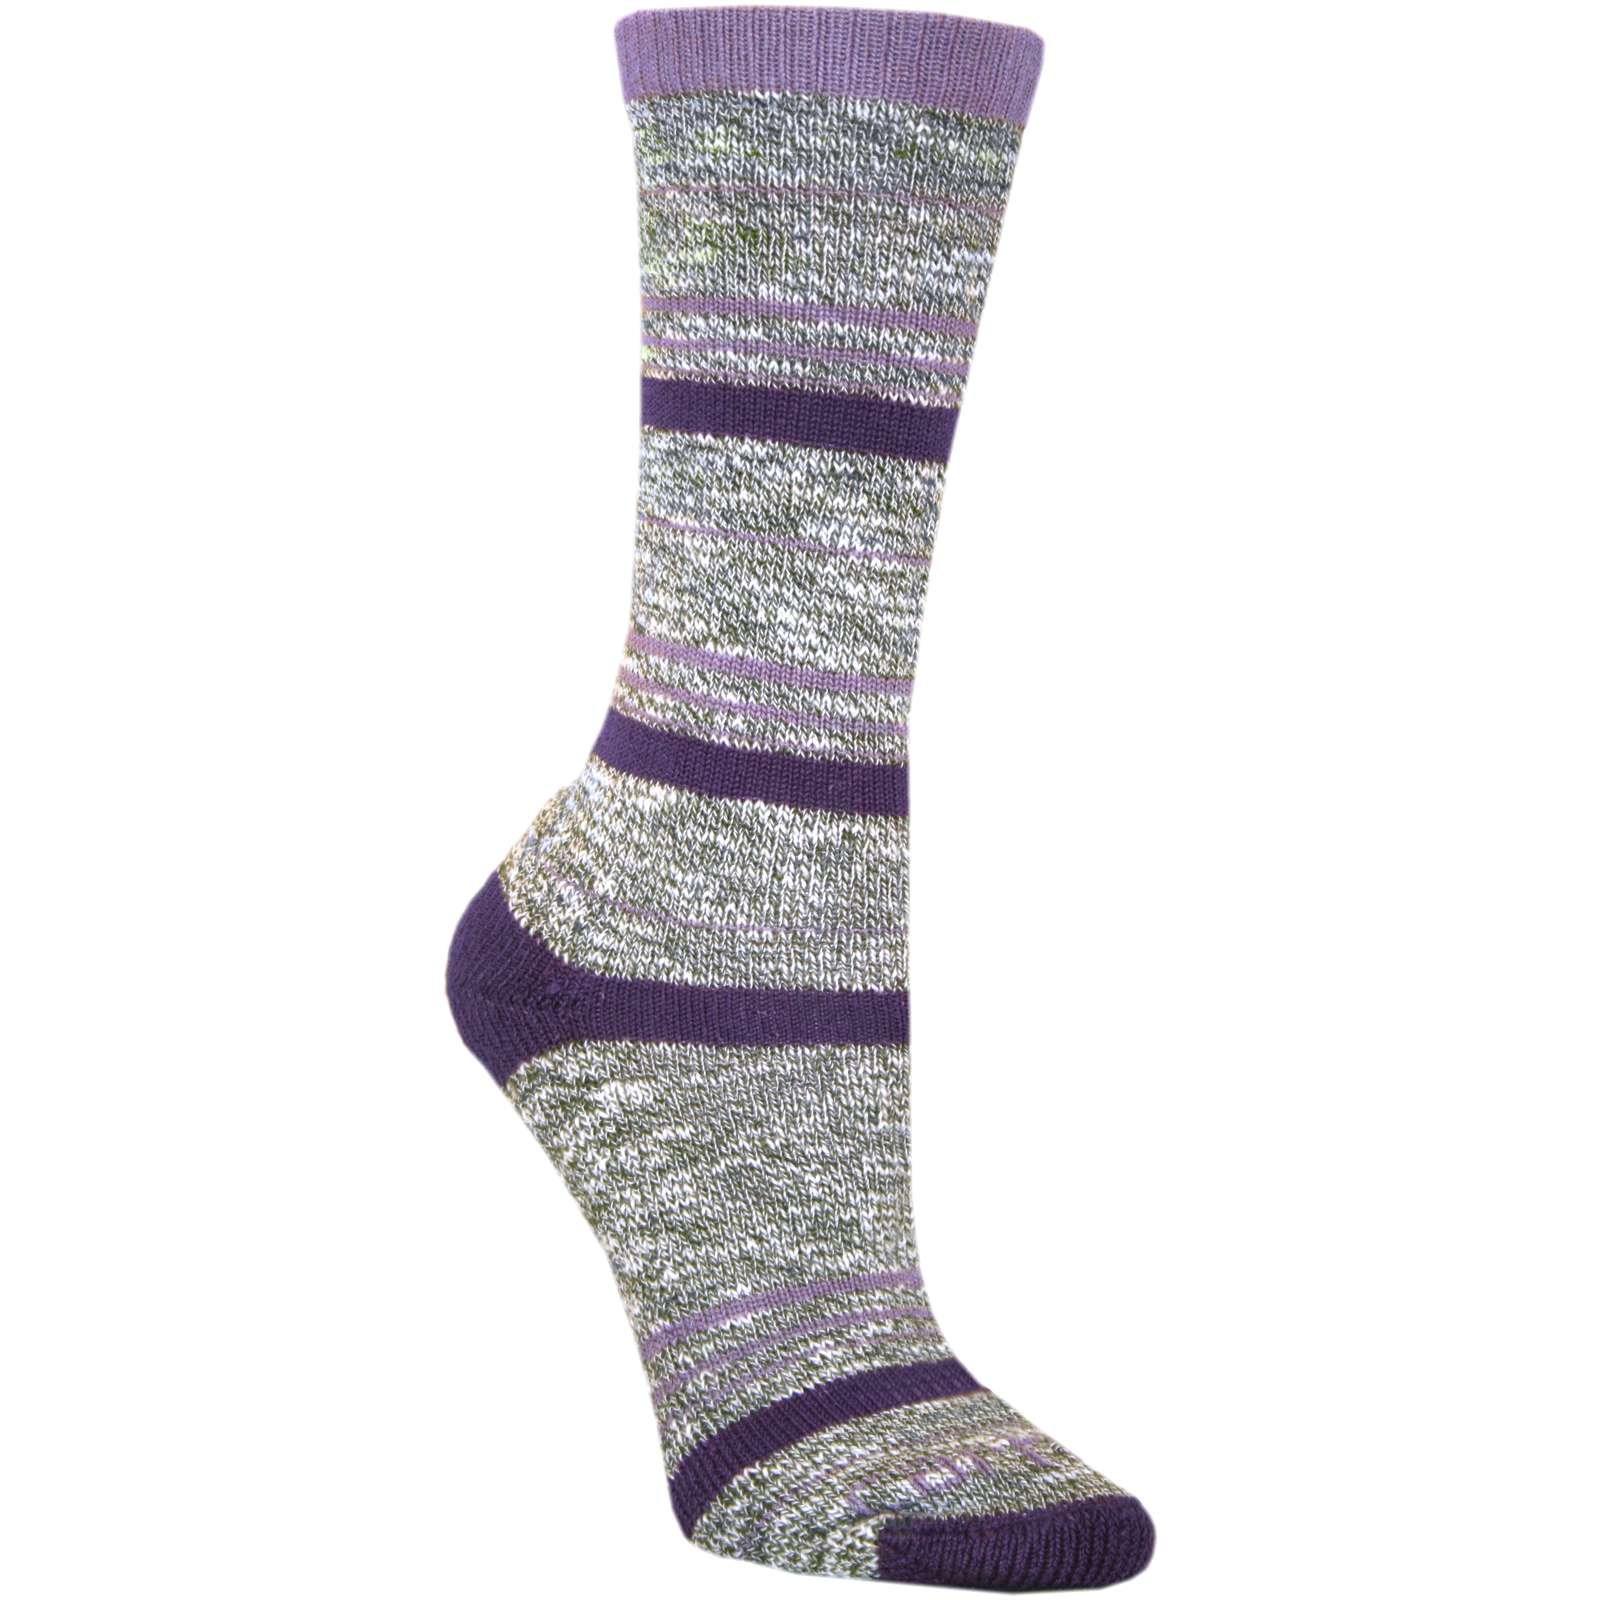 Carhartt Women's Merino Wool Slub Stripe